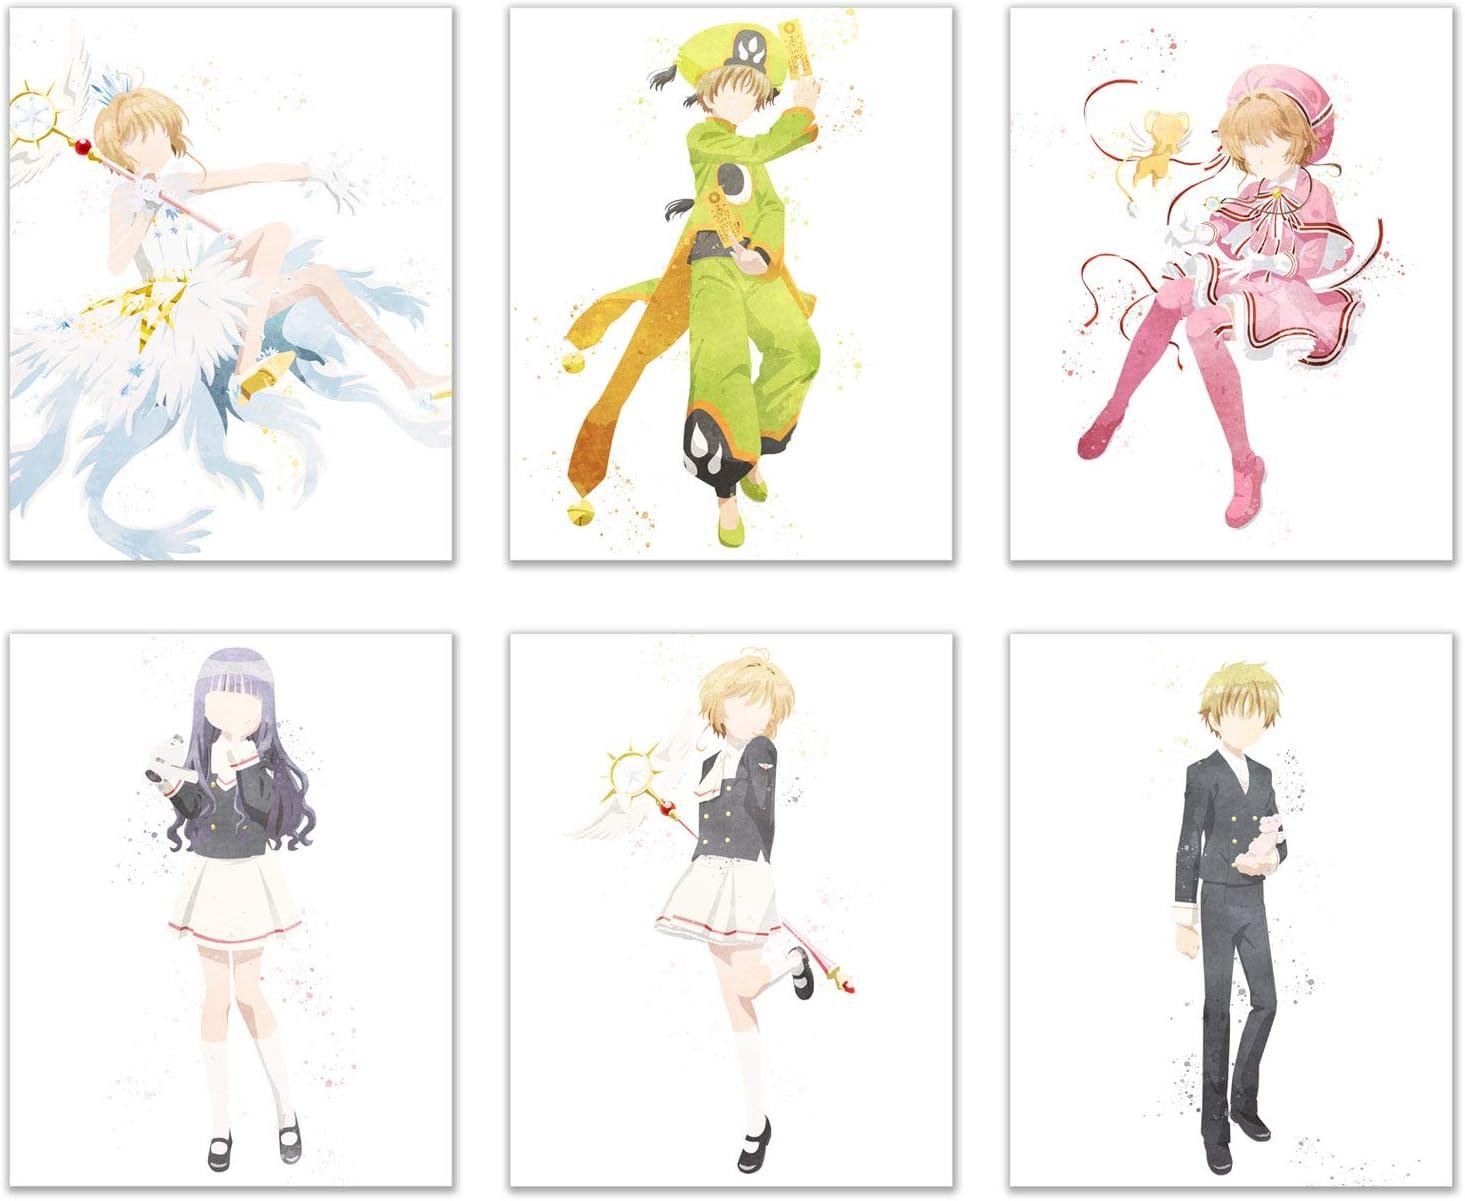 4236 Cardcaptor.Sakura Clear Card hen Anime manga wall Poster Scroll